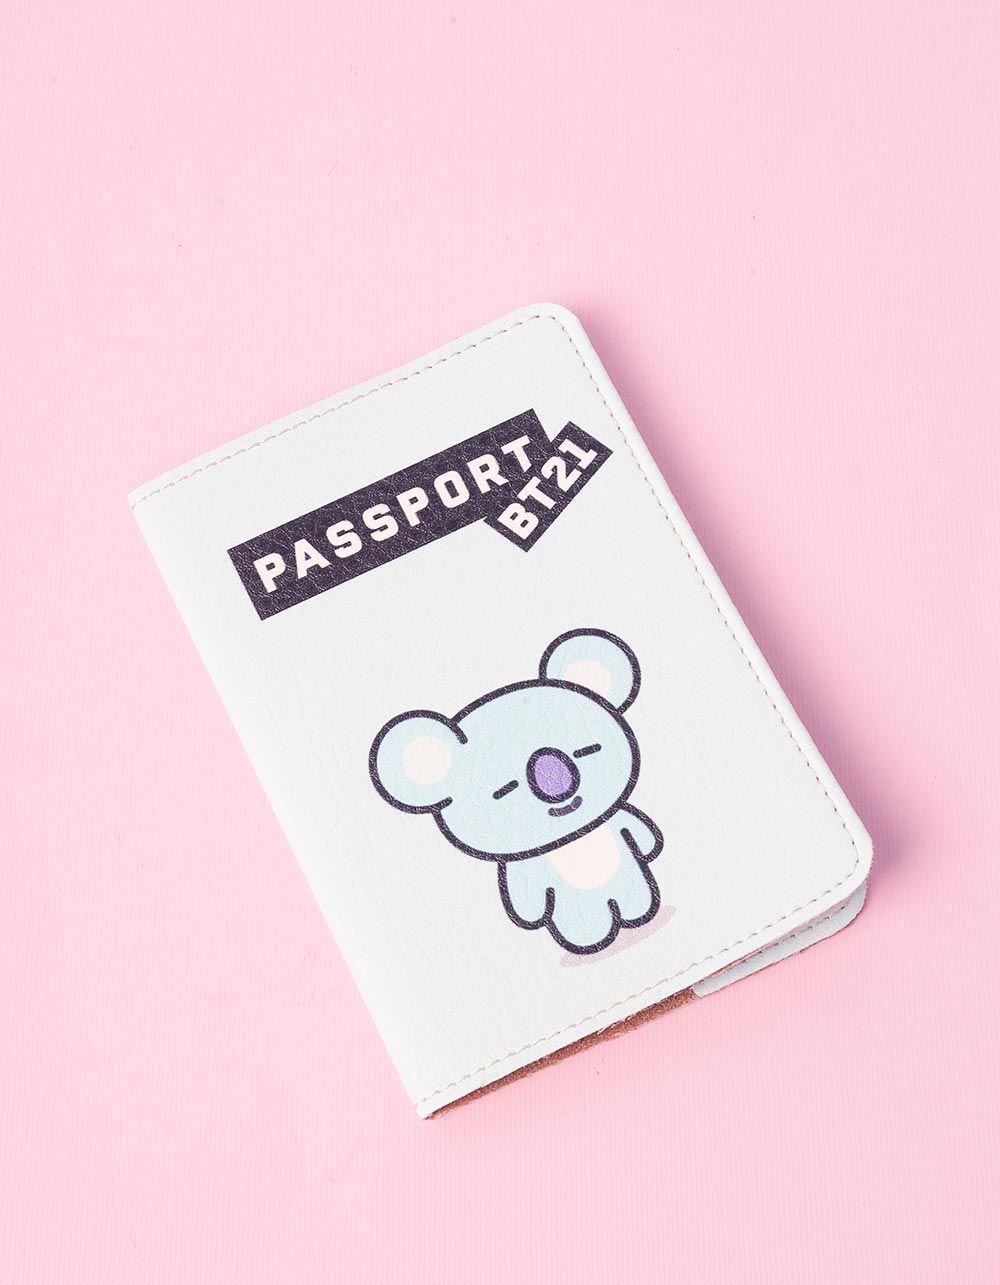 Обкладинка на паспорт з принтом KOYA Рэп Монстр bts bt21 | 237251-18-XX